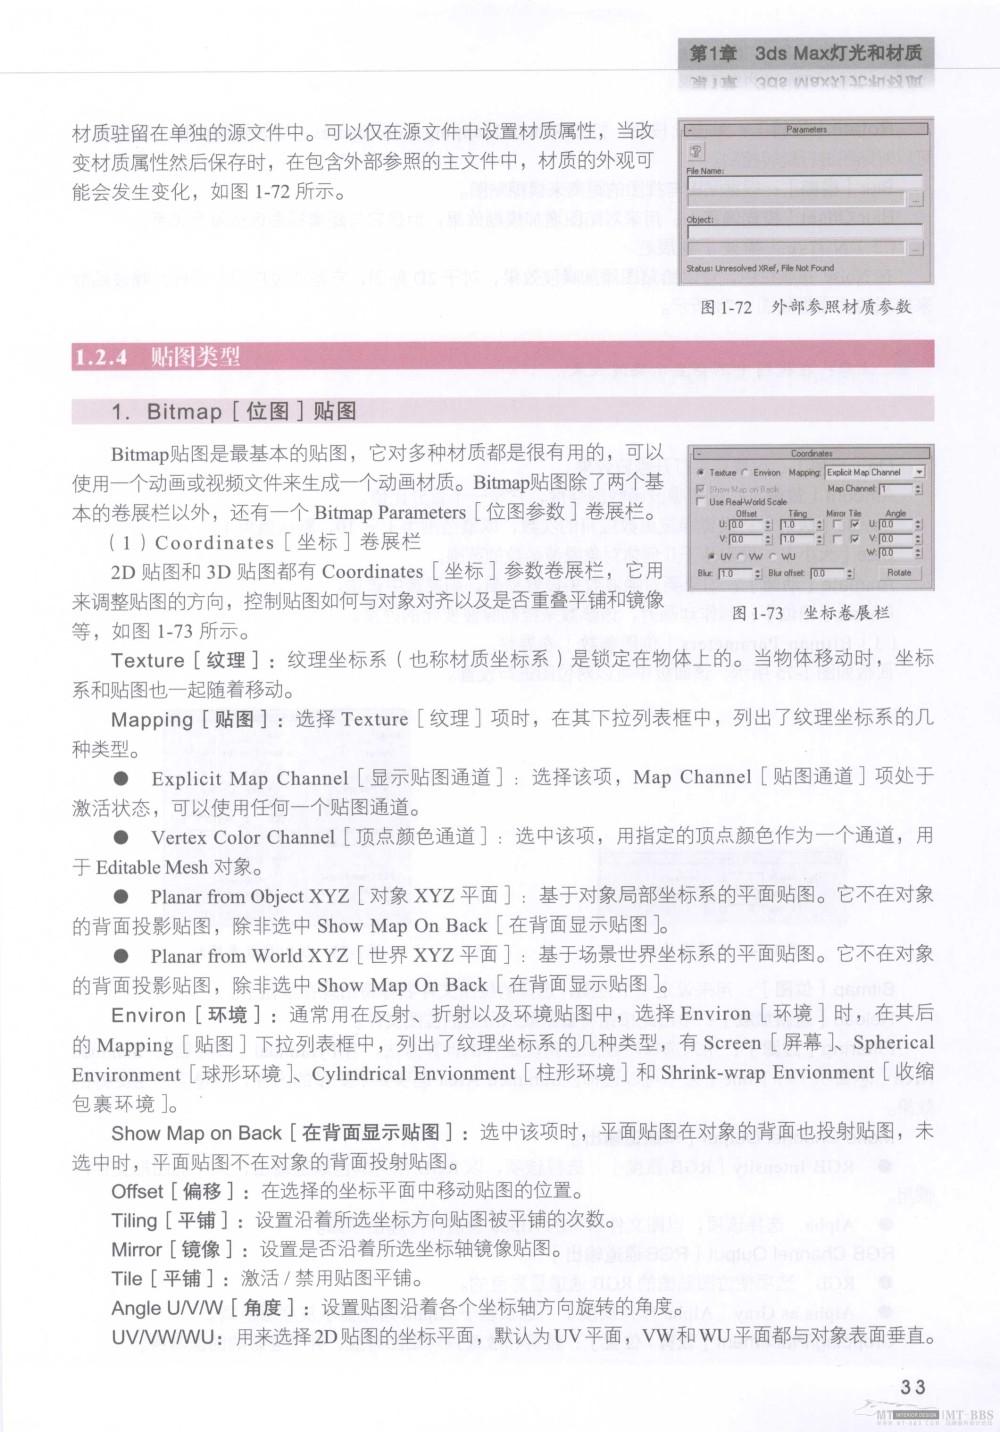 水晶石技法-3ds_Max&VRay室内空间表现_水晶石技法-3ds_Max&VRay室内空间表现_页面_039.jpg